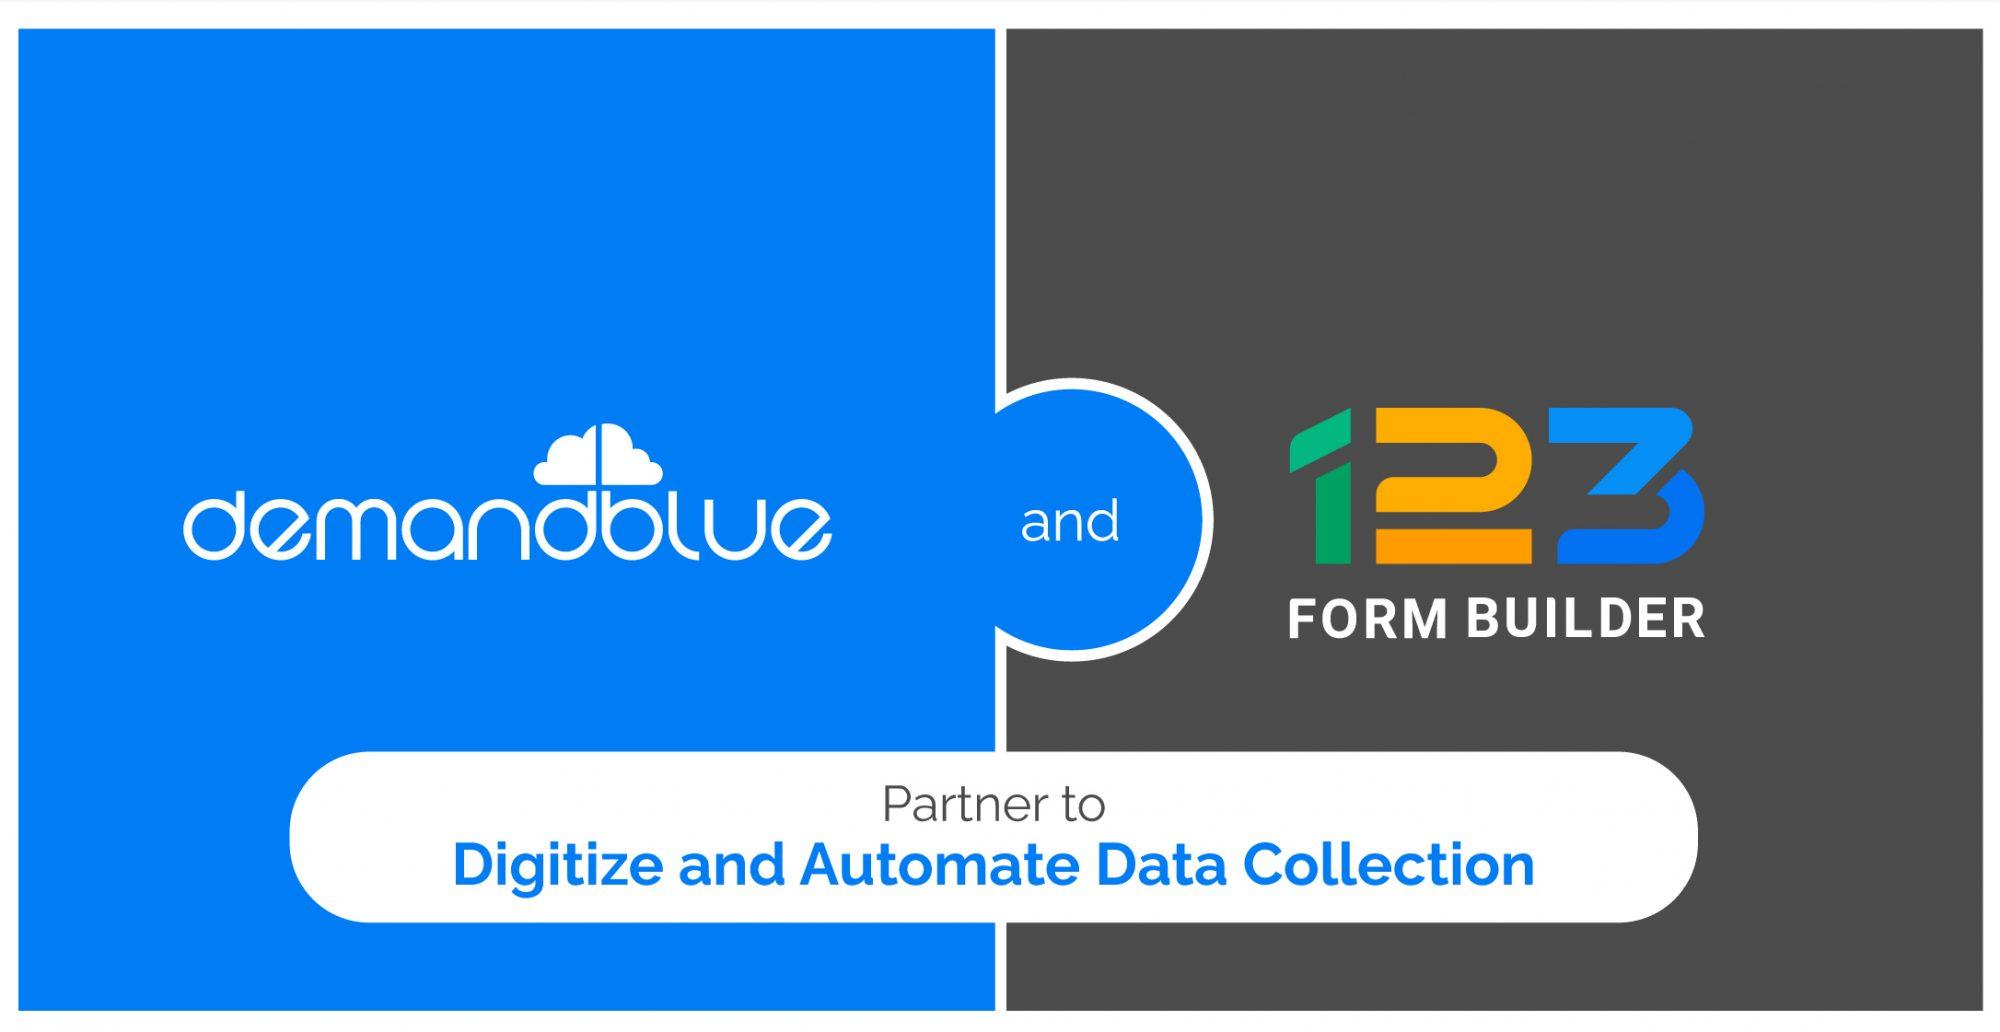 DemandBlue announces its partnership with 123FormBuilder